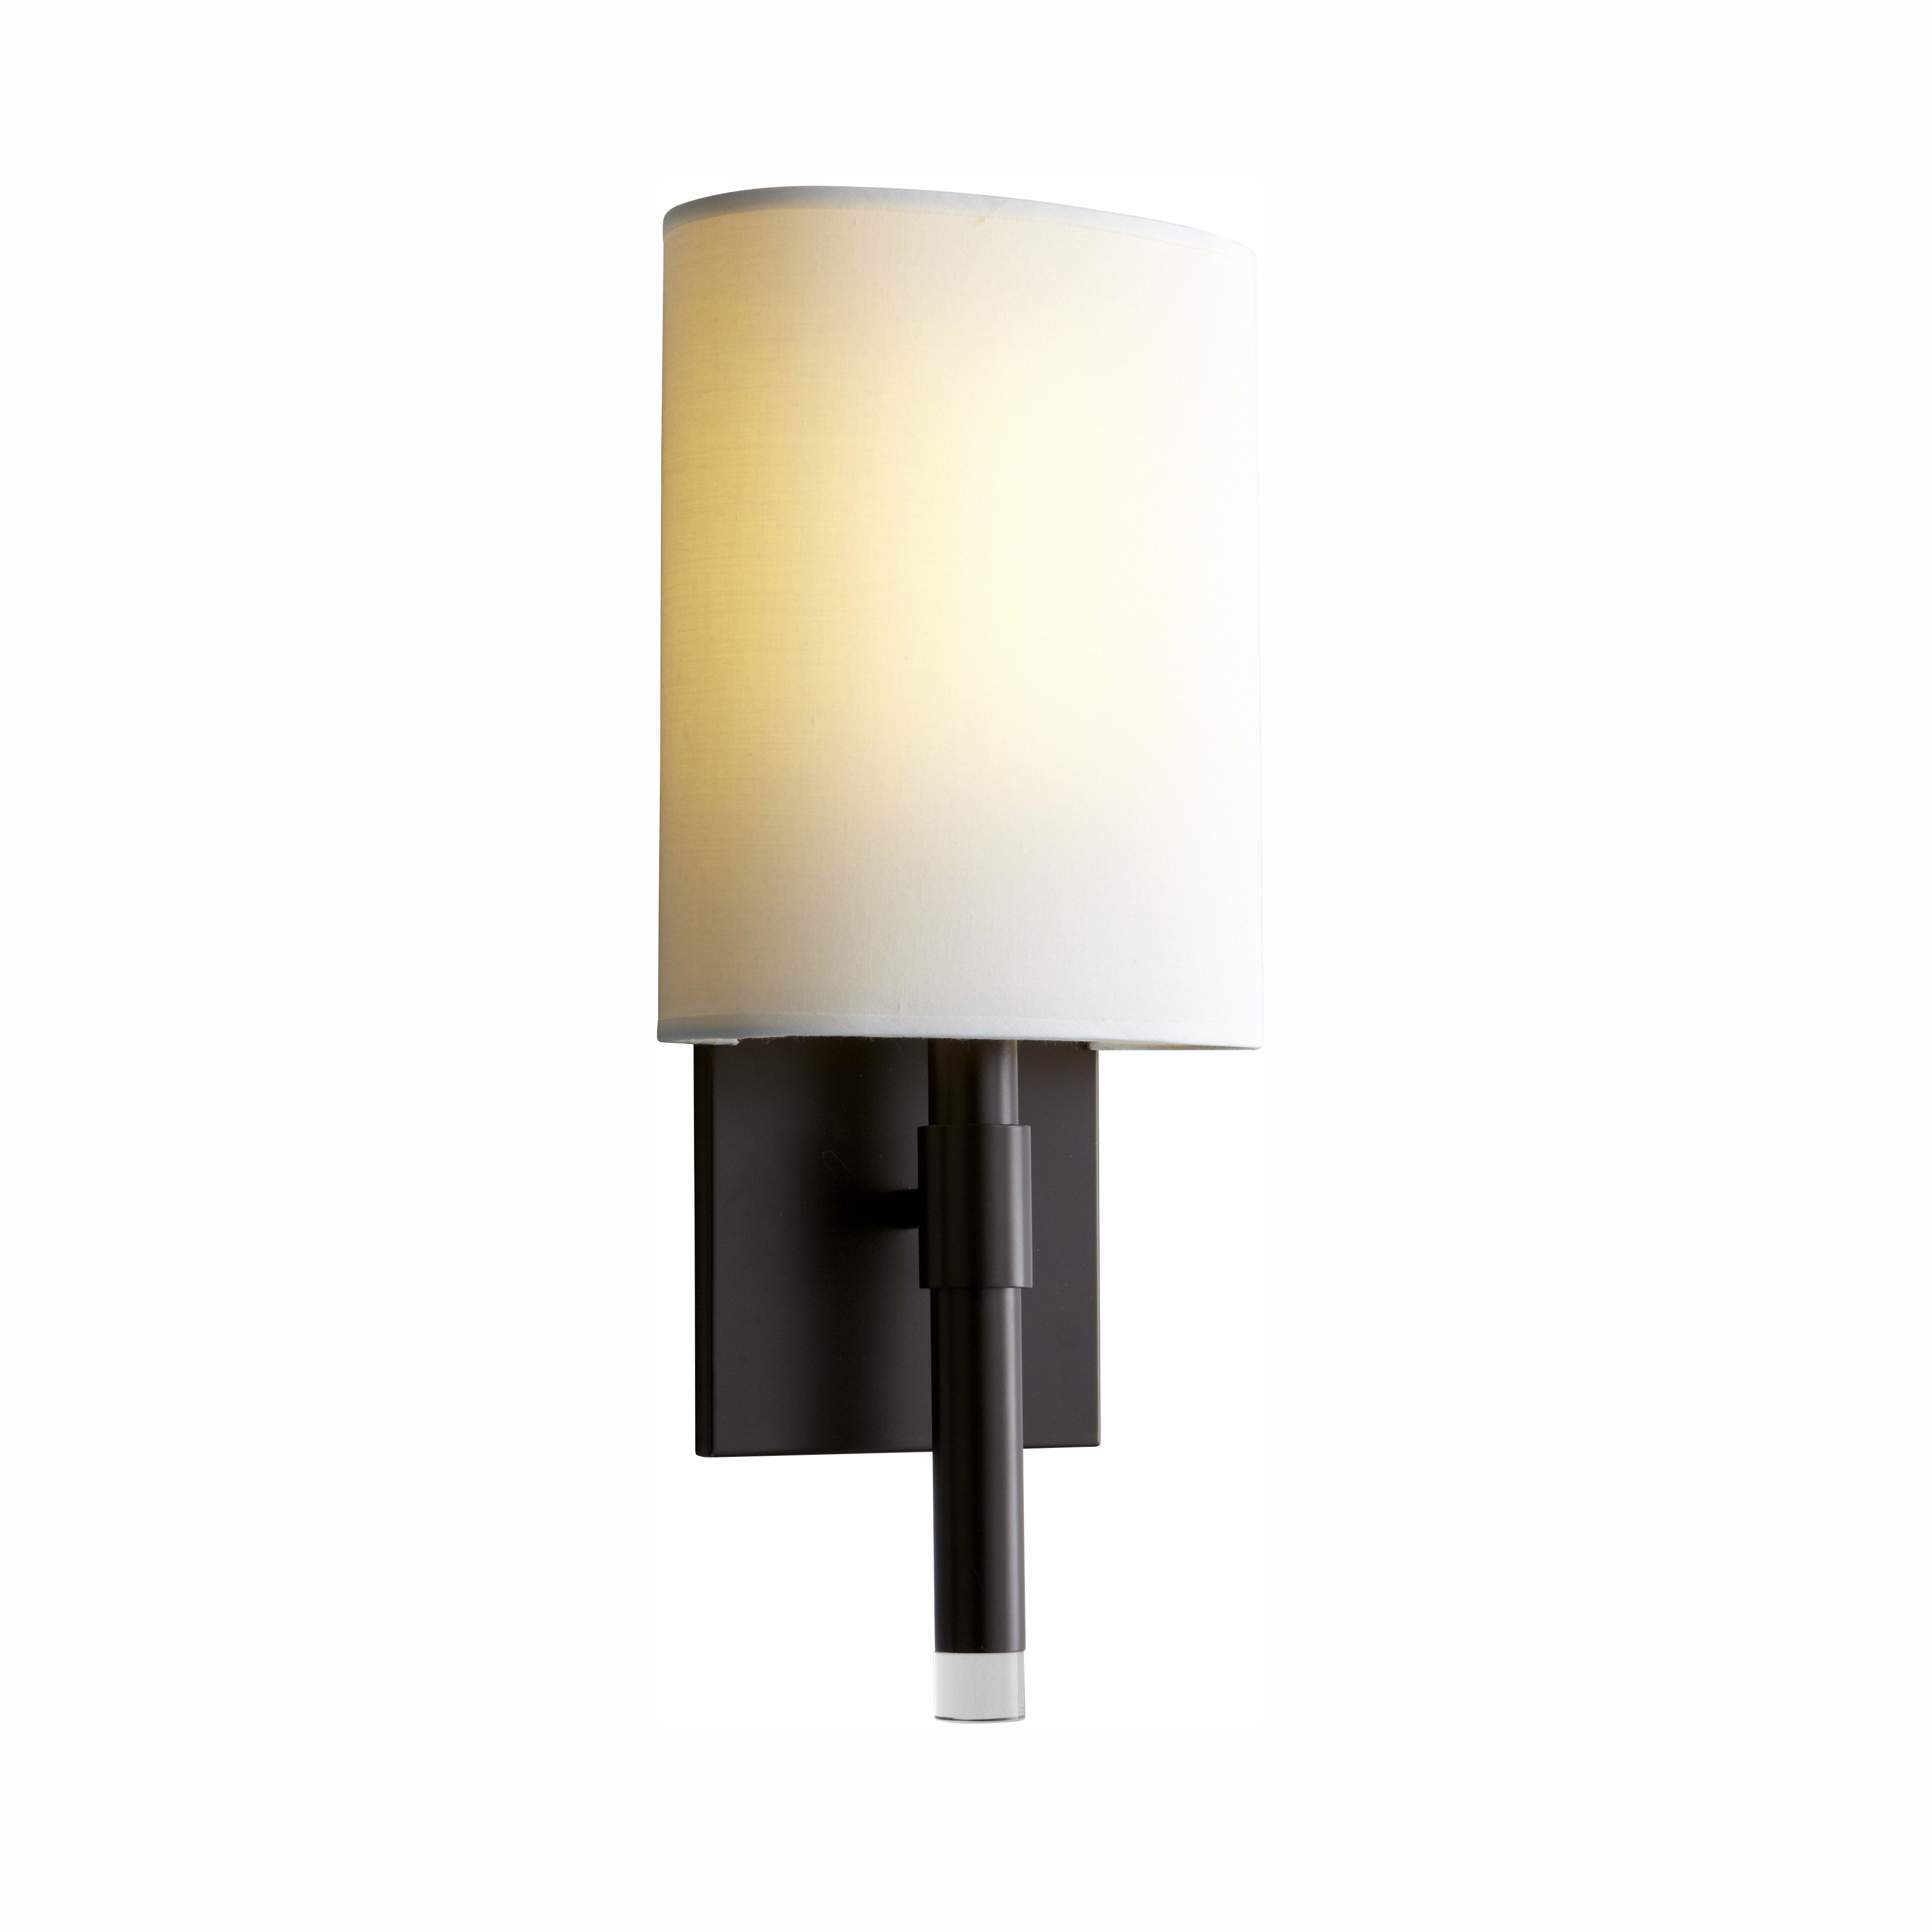 Oxygen Lighting 3 587 295 Old World Matte White Beacon 17 Tall Ada Single Light Led Bathroom Sconce With Acrylic Half Cylinder Shade Lightingdirect Com